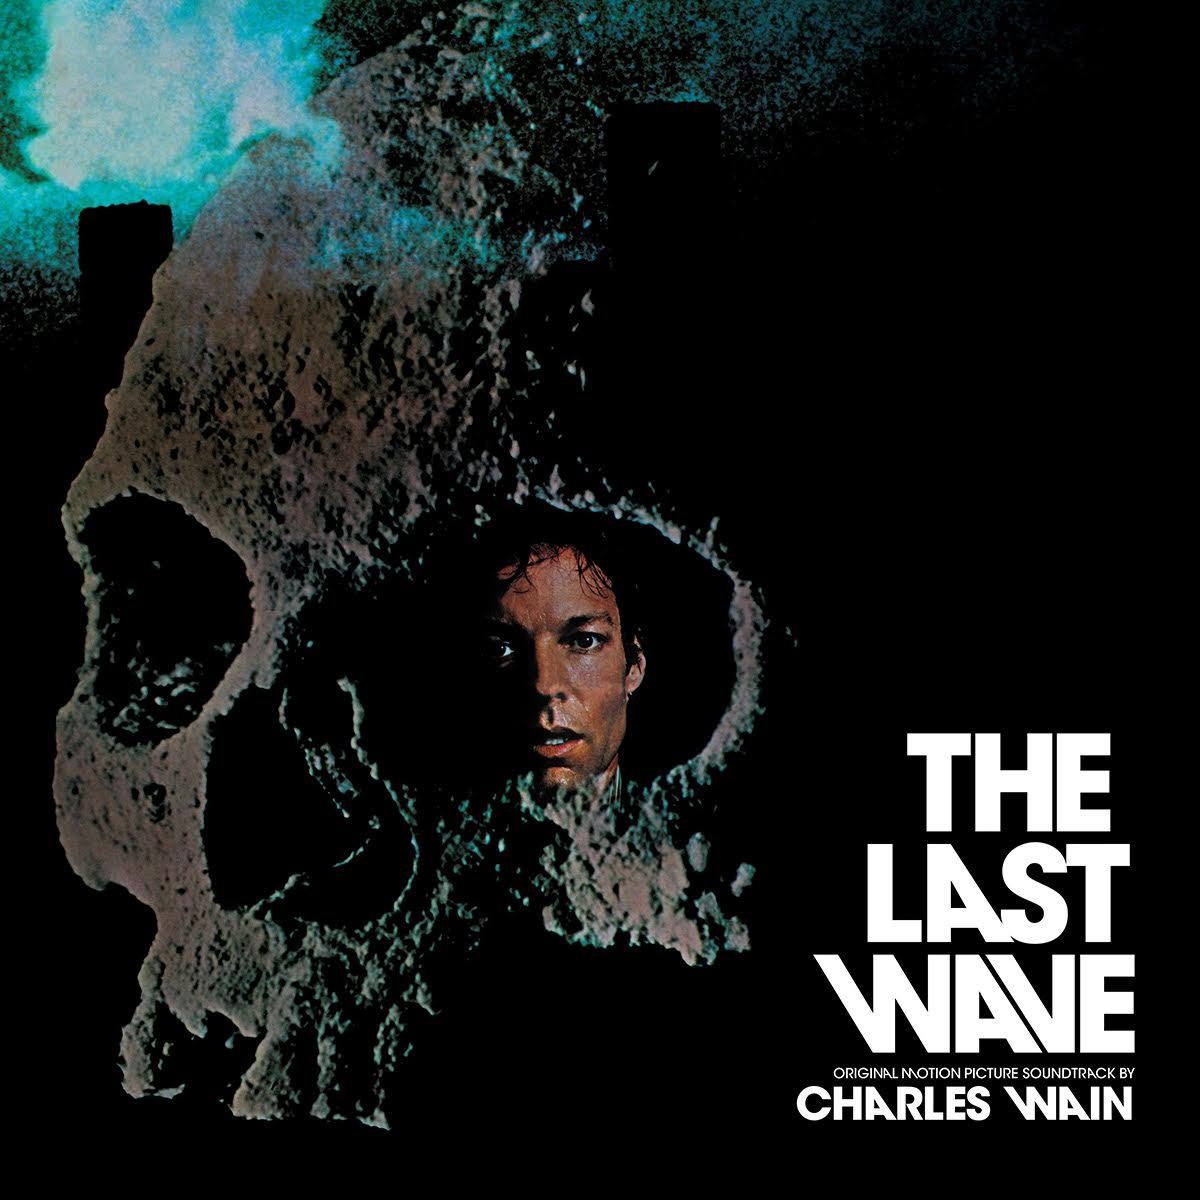 The Last Wave album cover